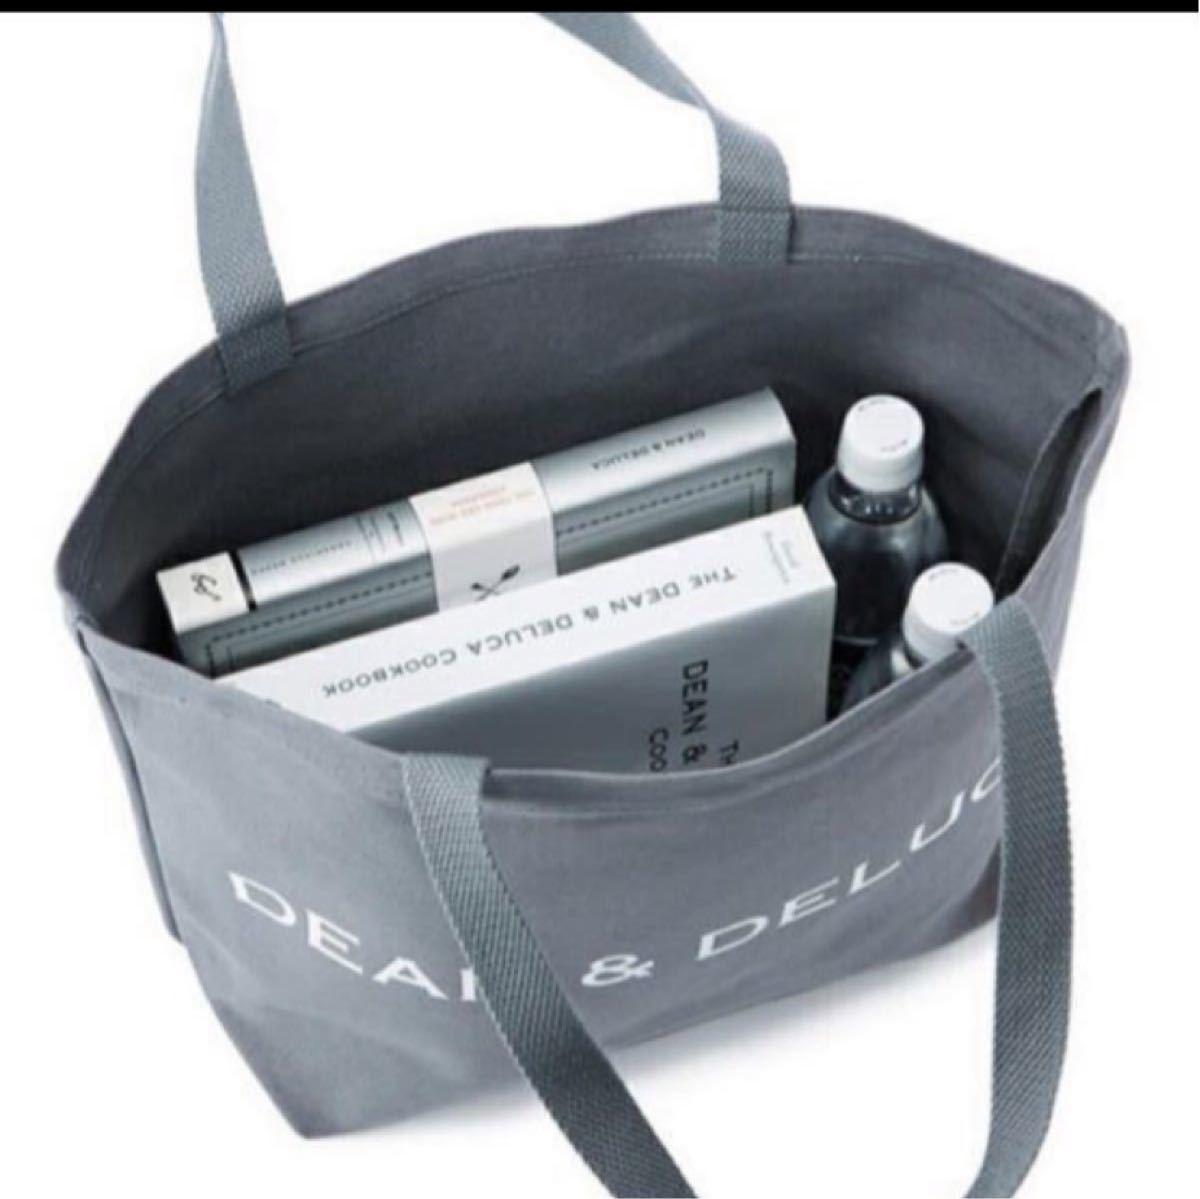 DEAN&DELUCA  トートバッグ 保冷バッグ     エコバッグ ベストセラーズバッグ3点セット